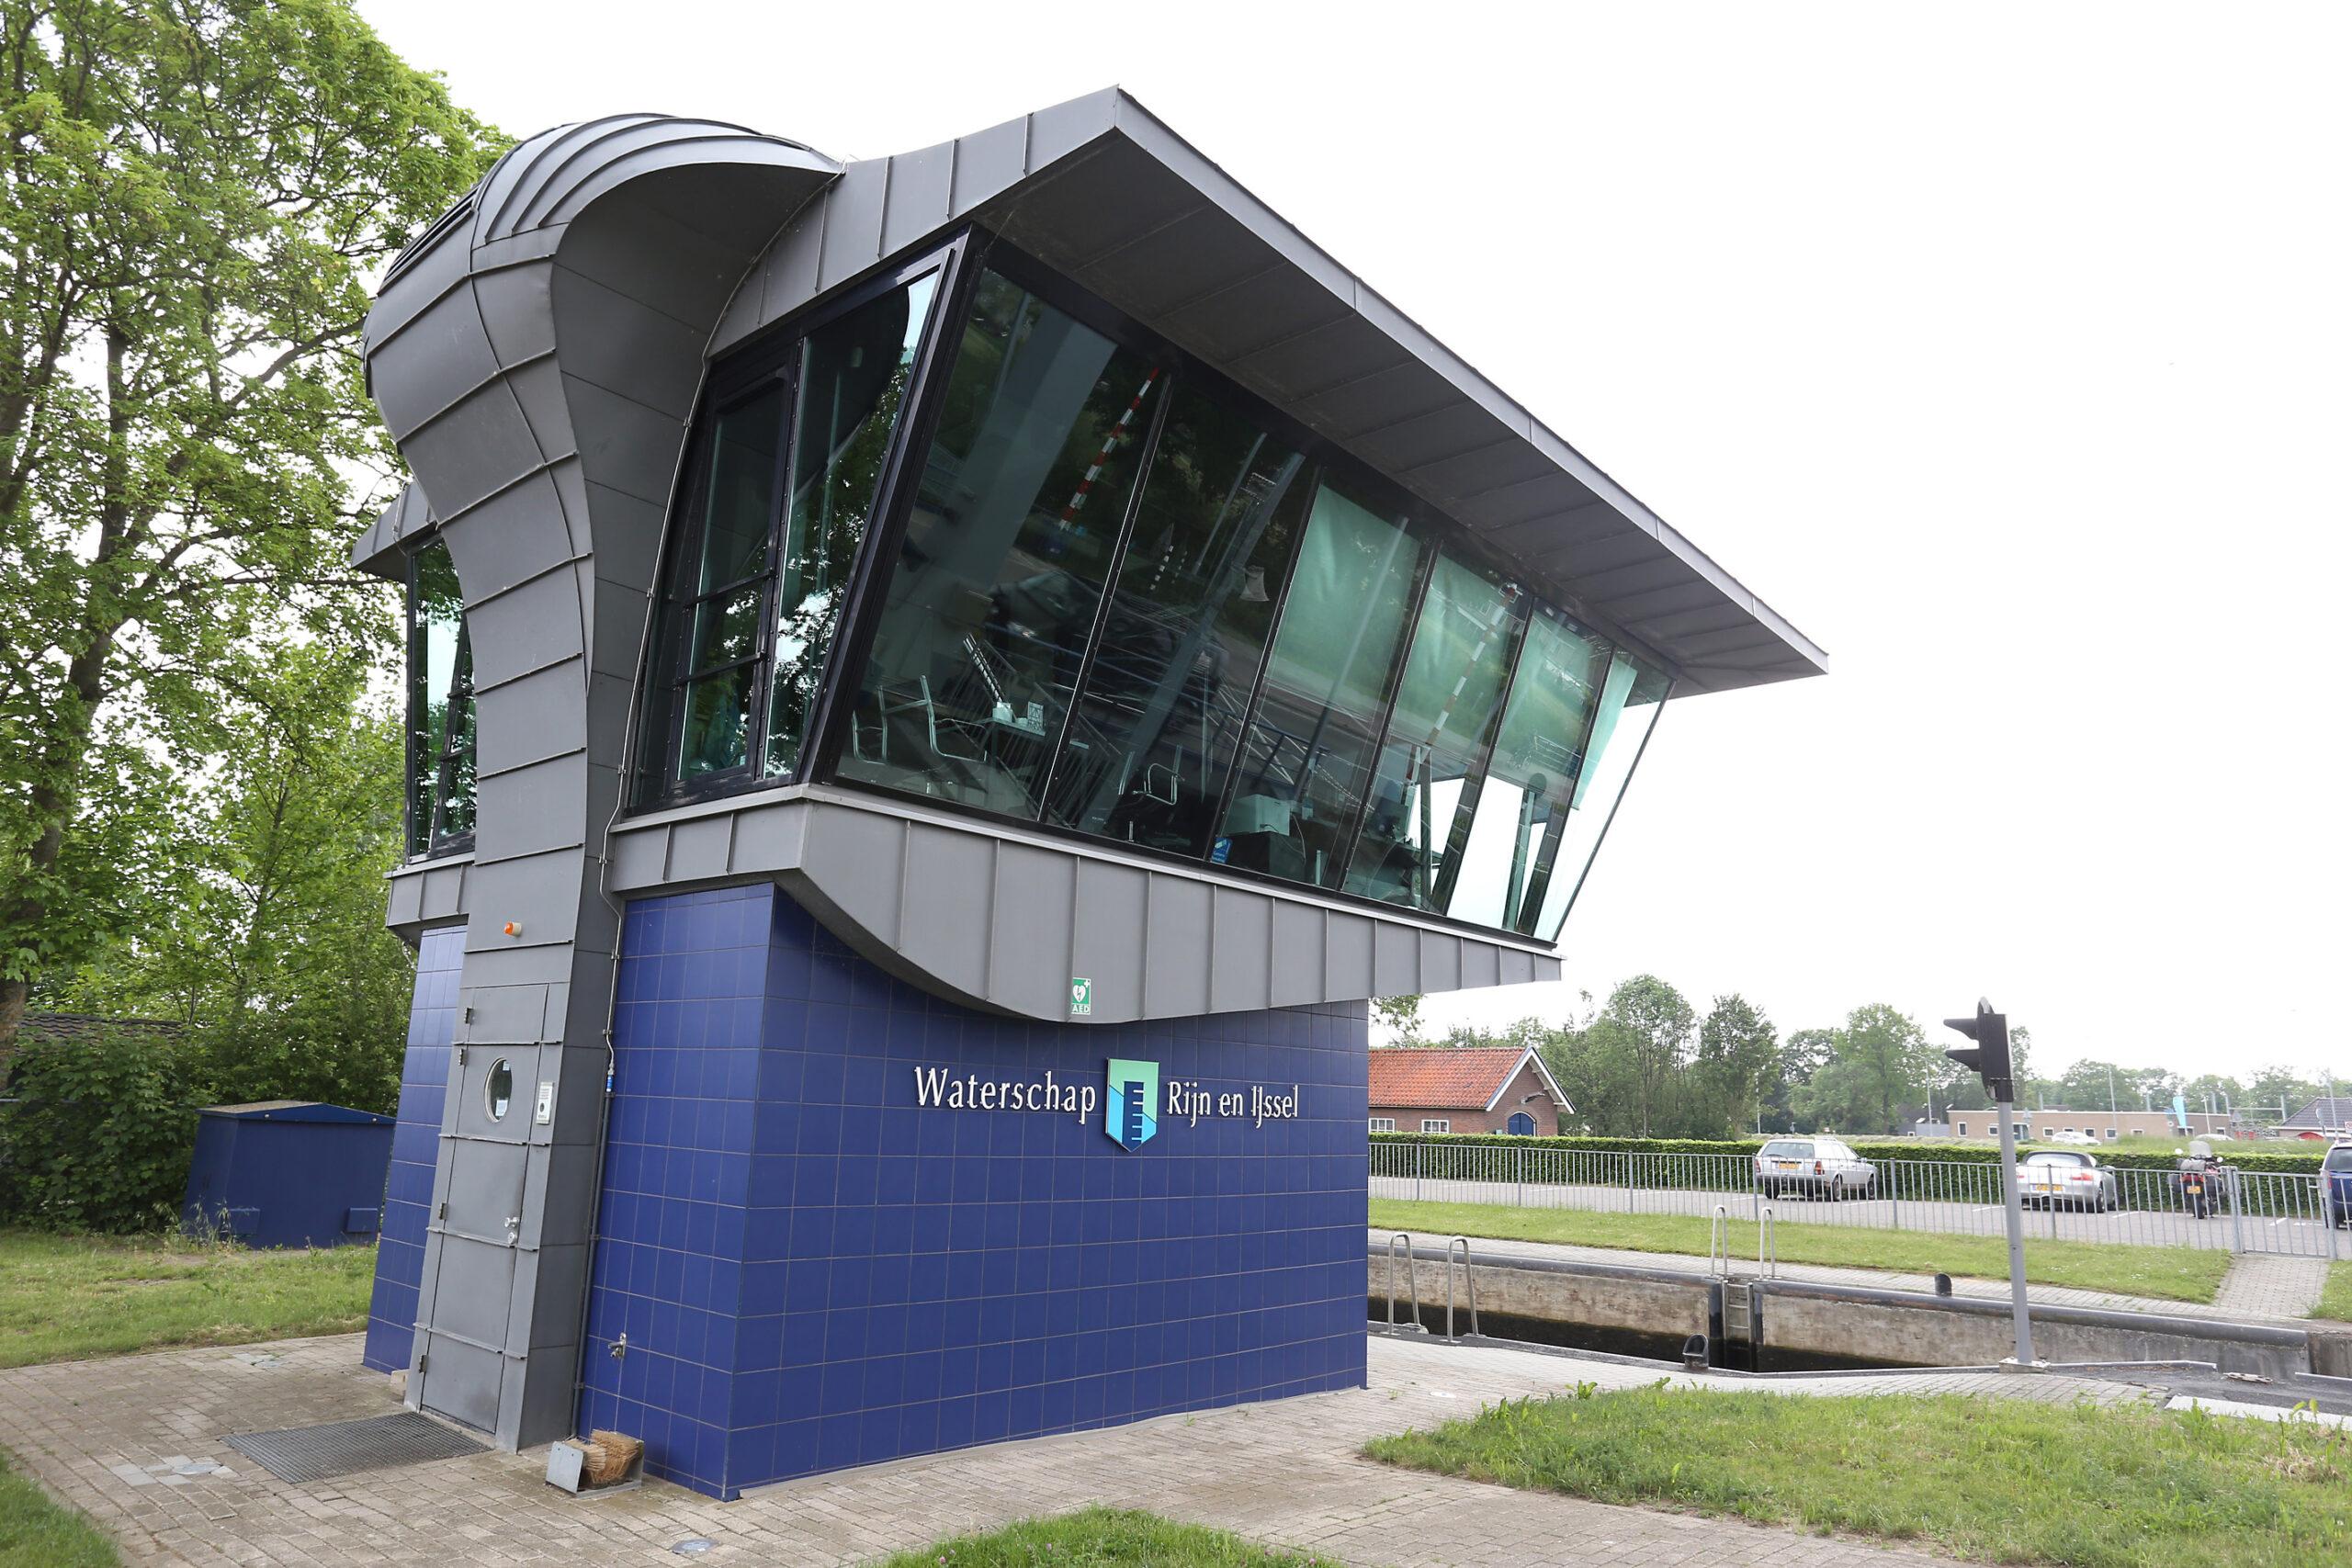 HAARST v. DOESBURG Vistrap WS Rijn en IJssel Site JourneeIMG_8985